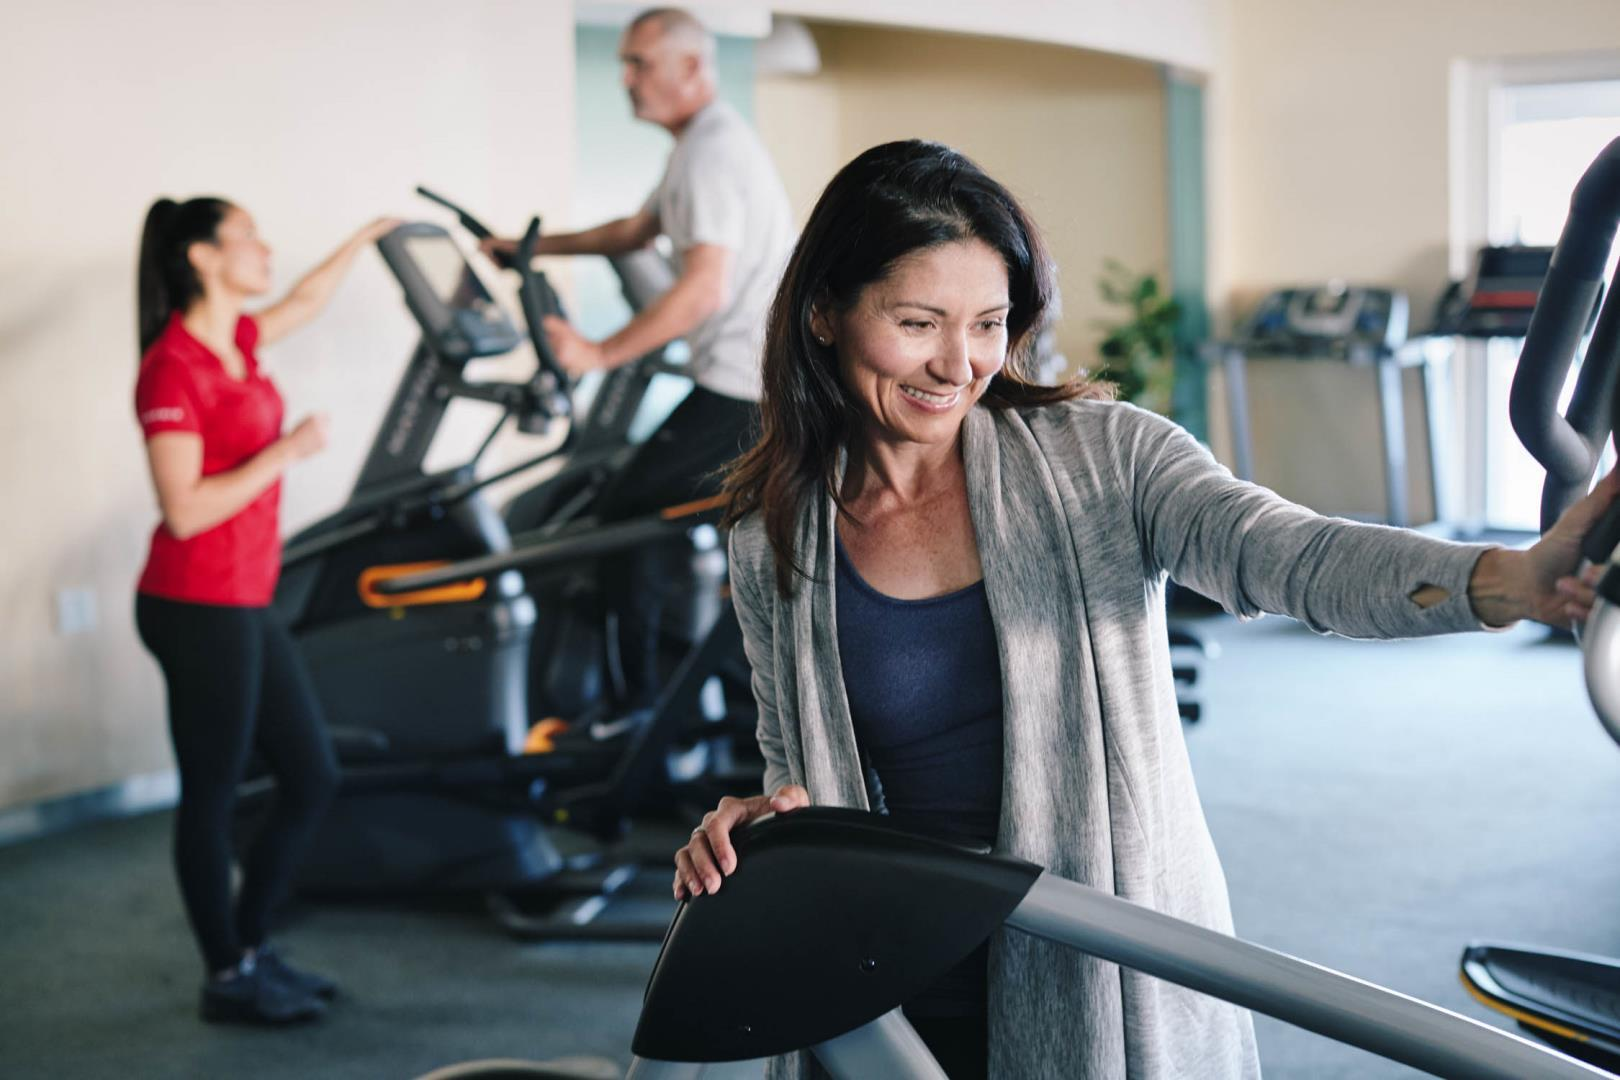 Johnson Fitness & Wellness - Inver Grove Heights, MN